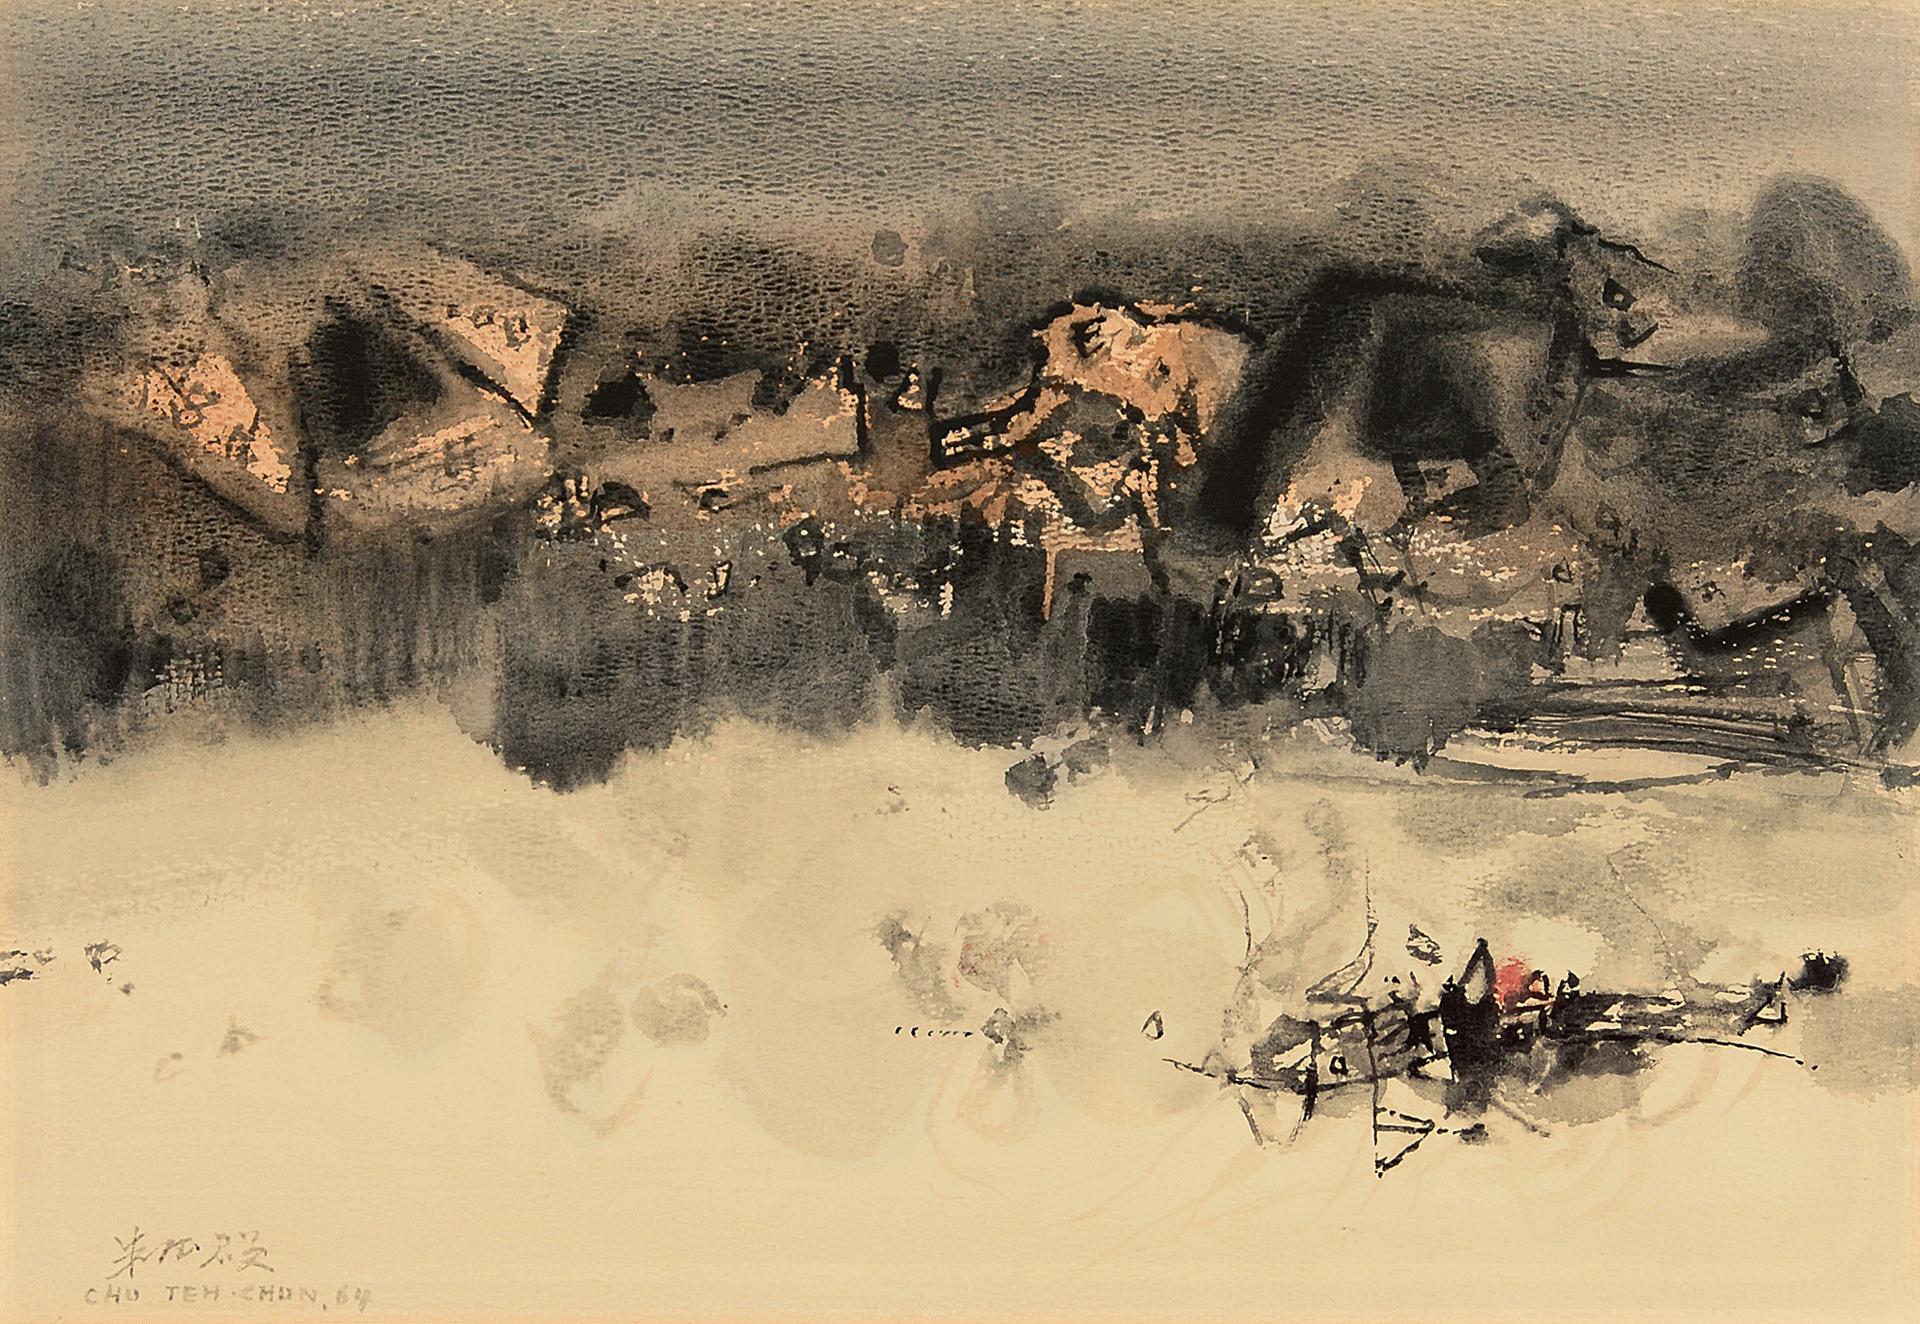 Chu Teh-Chun, Composition No. 206